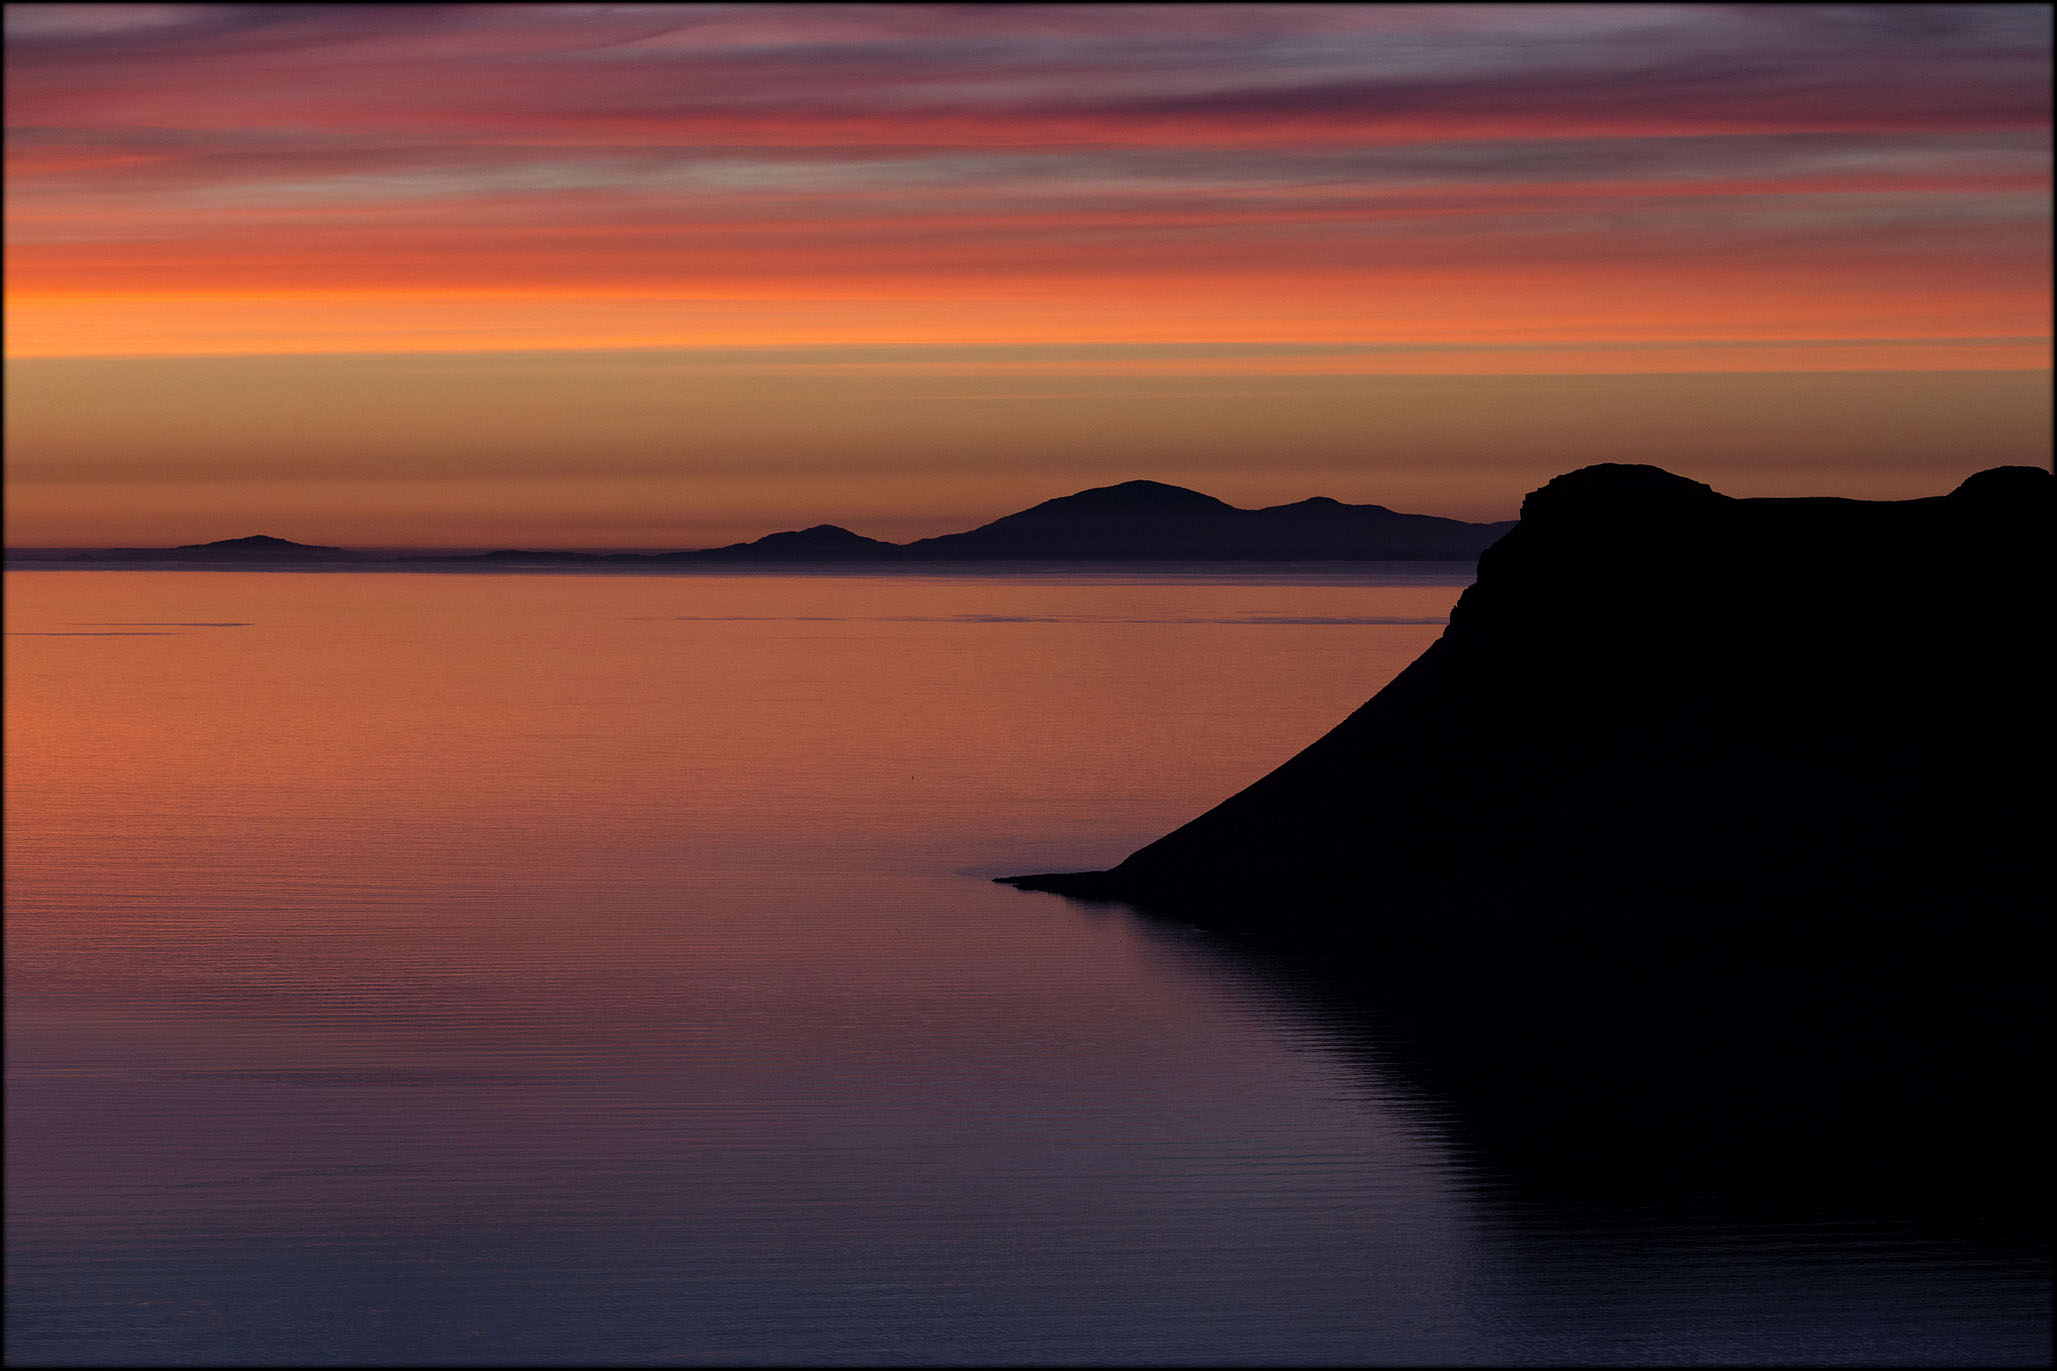 sunset - isle of skye